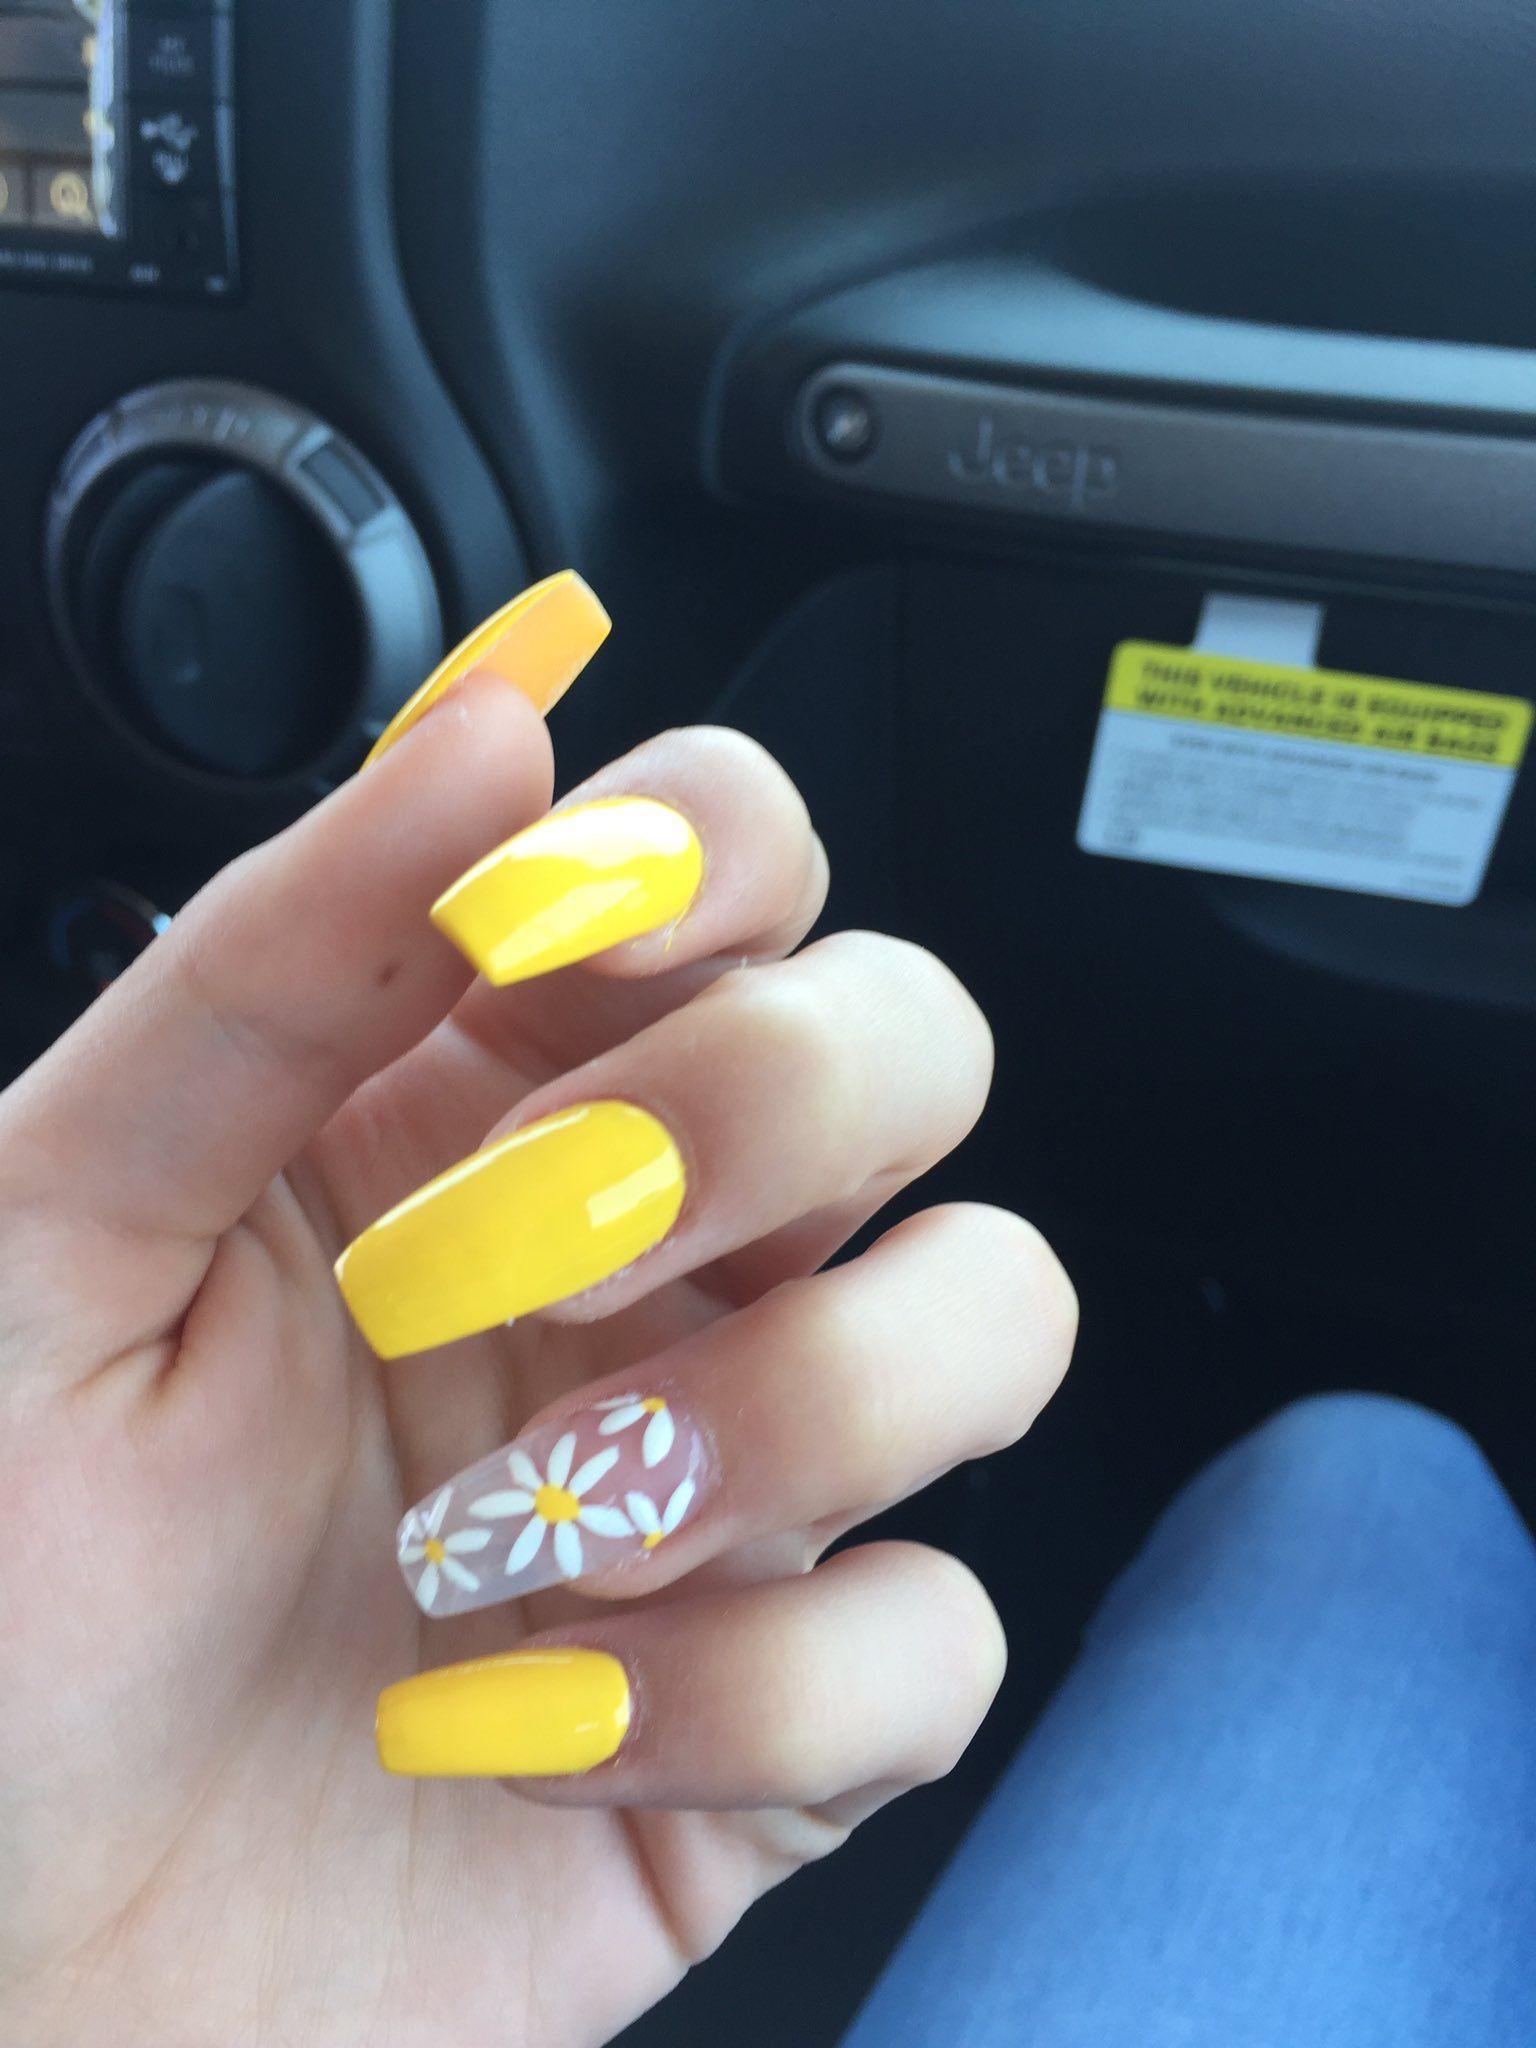 30 Cute Nail Art That You Will Love Sunflower Nails Yellow Nails Fake Nails